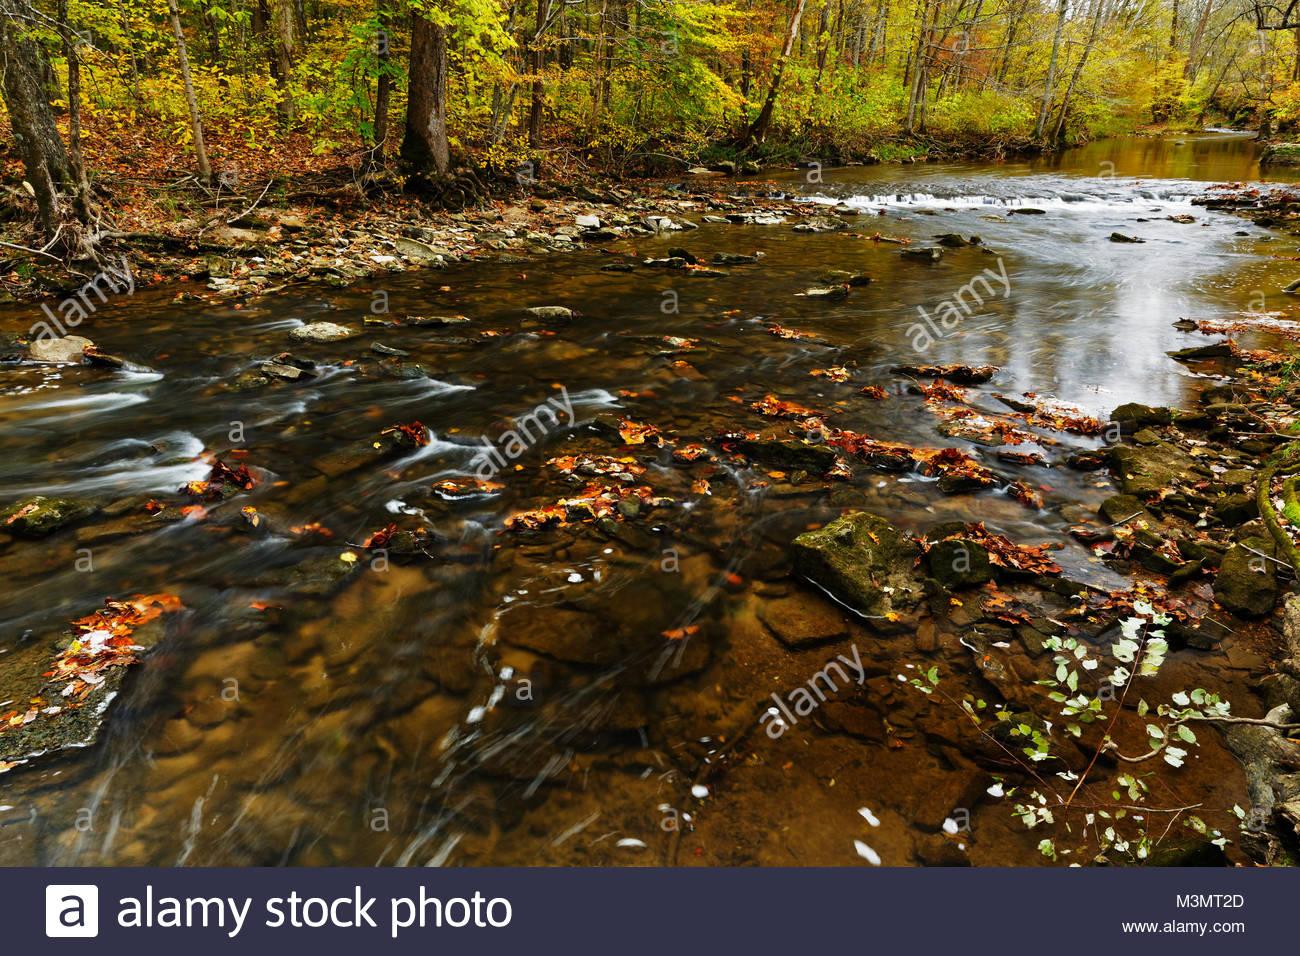 Autumn Creek, Anderson Falls Park, Columbus, Indiana - Stock Image